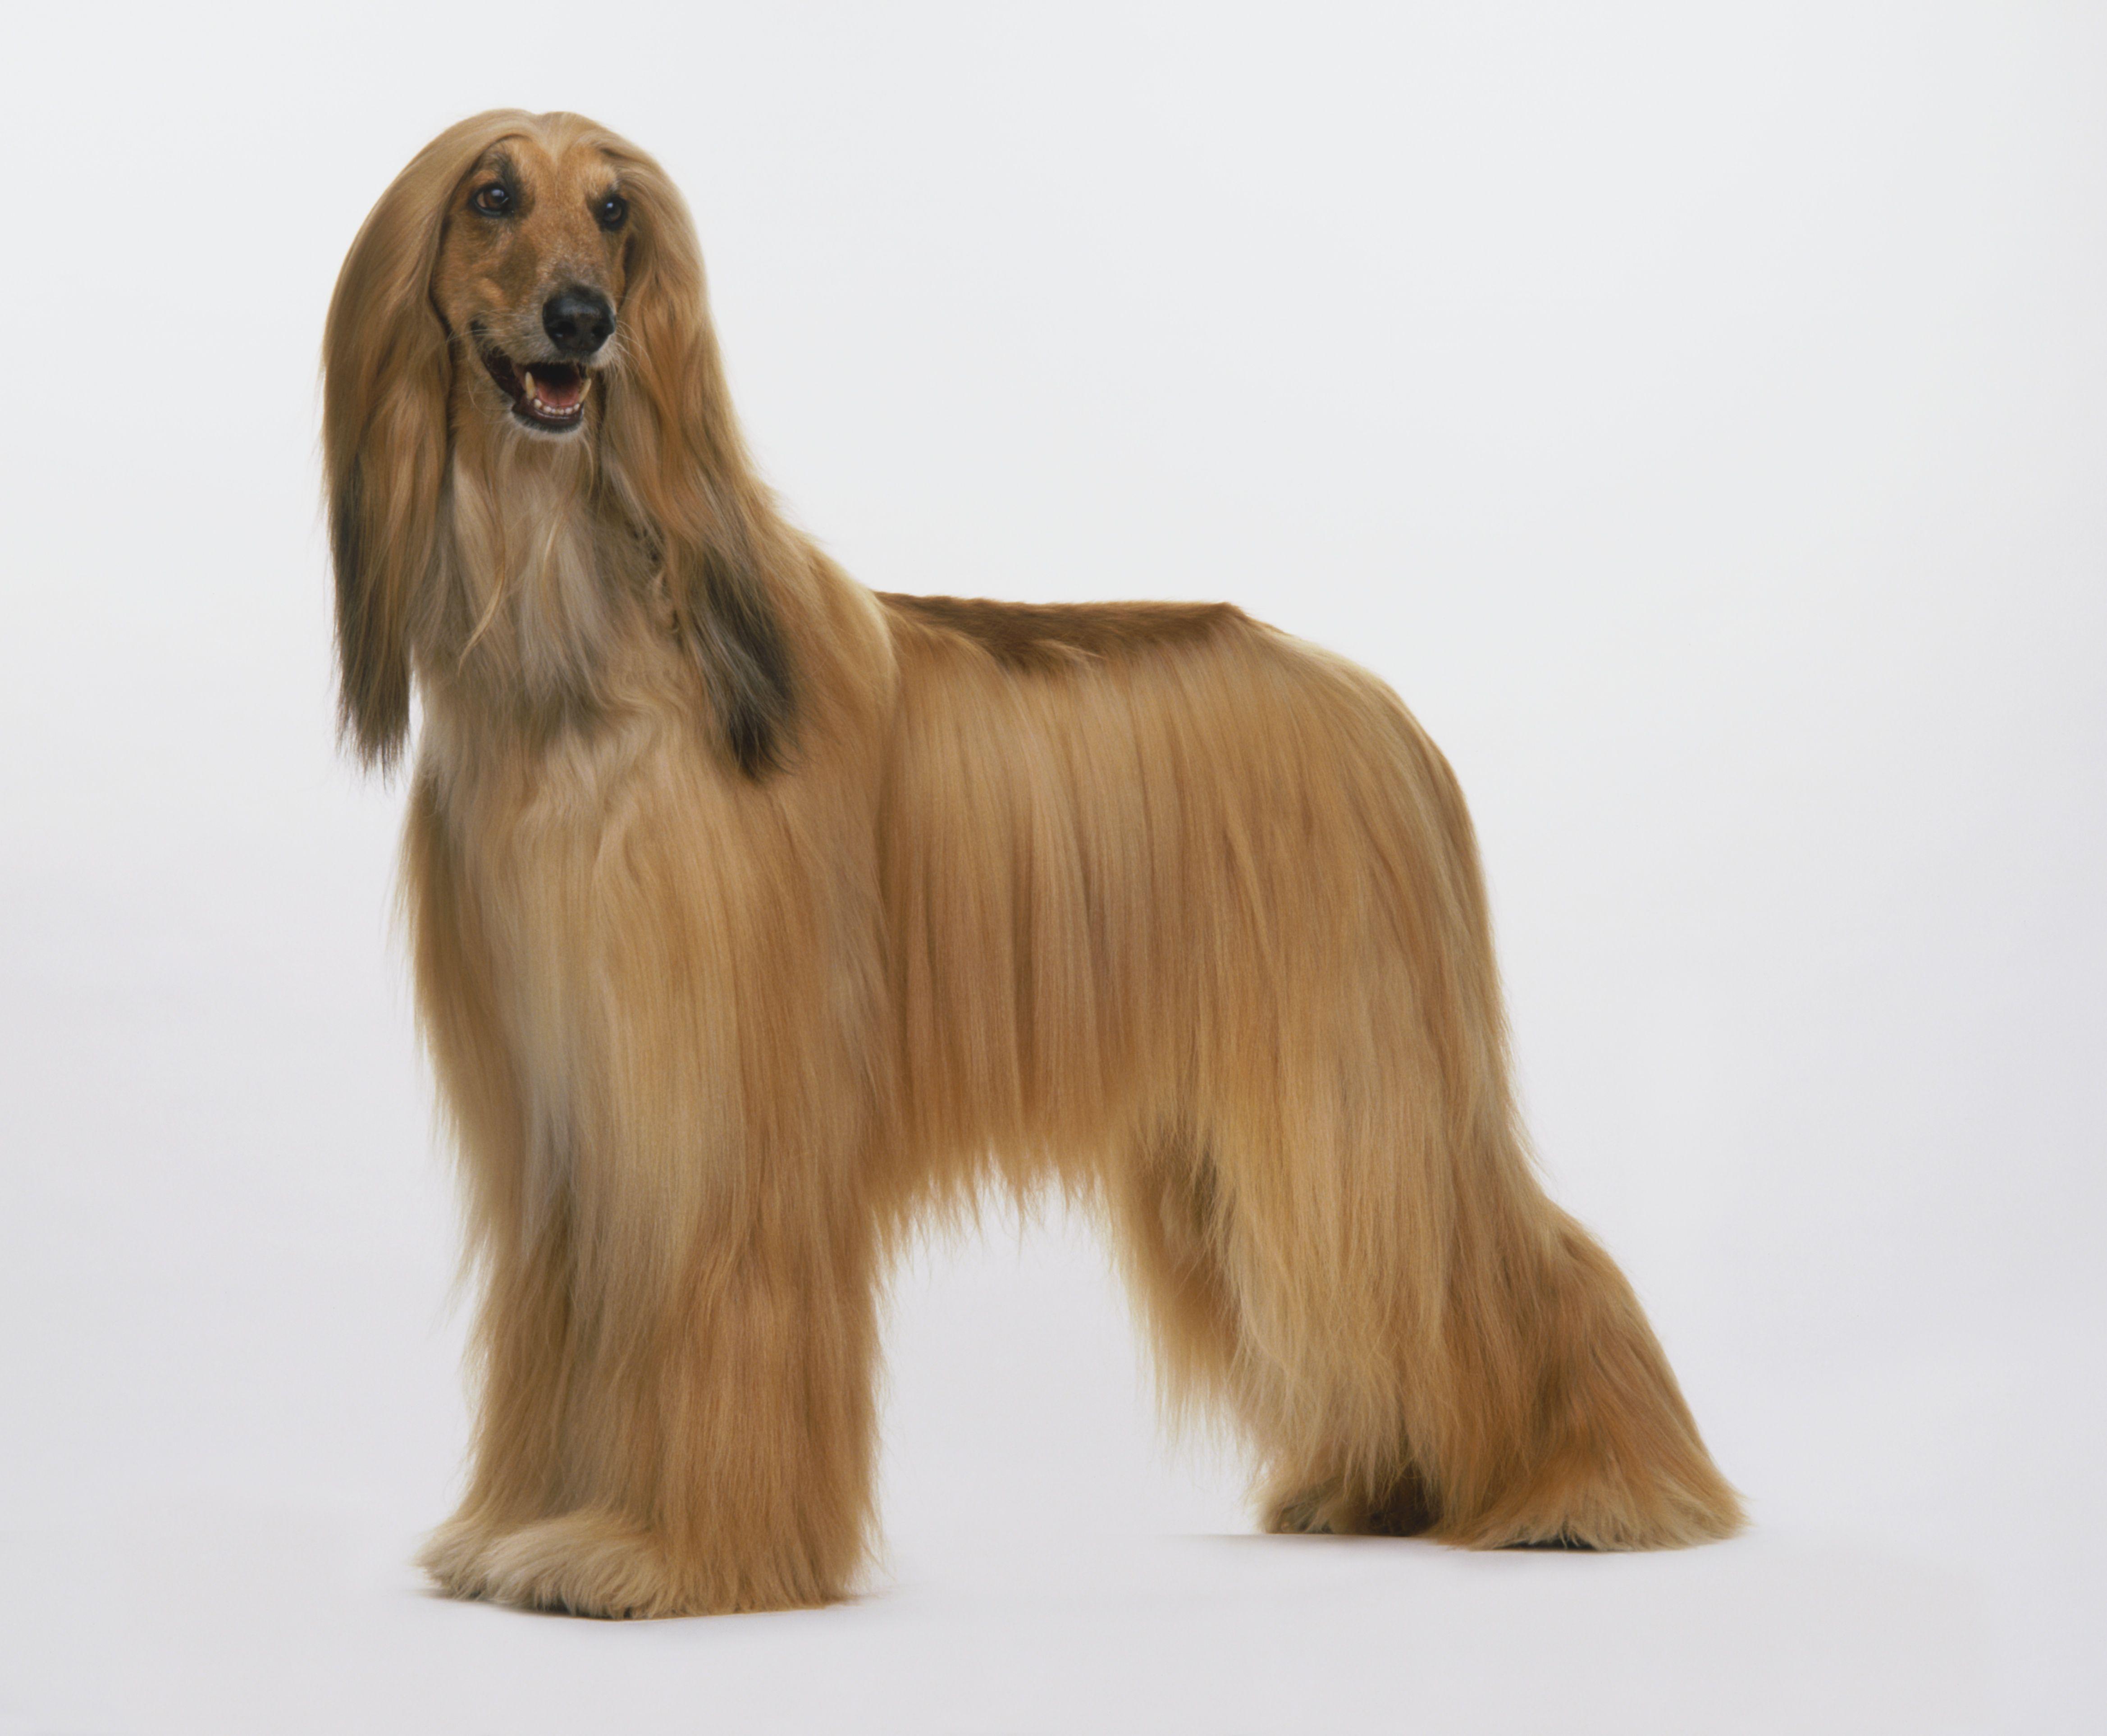 Afghan hound smiling